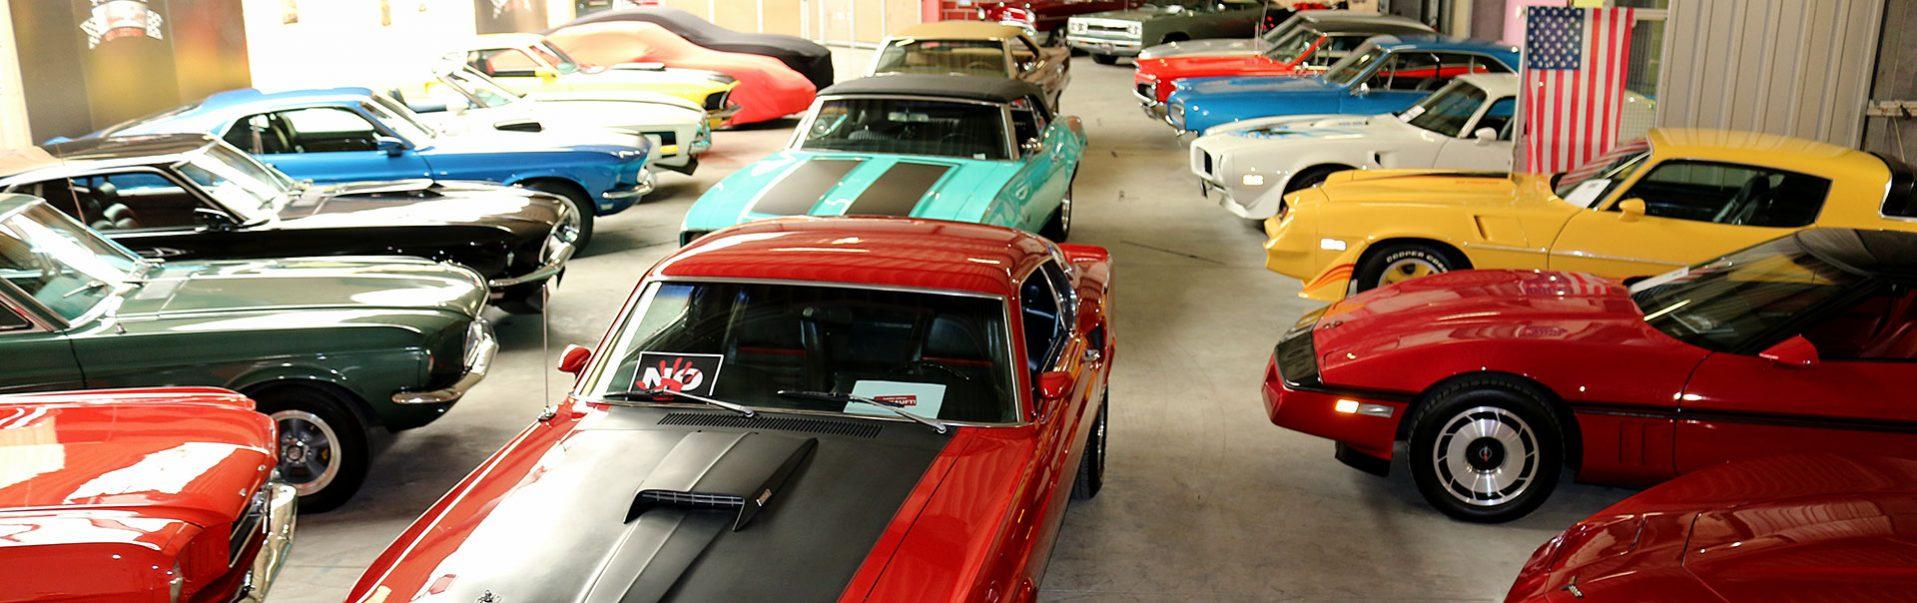 https://www.nr-classic-cars.de/wp-content/uploads/2019/01/Slider-Open-House-1917x603.jpg